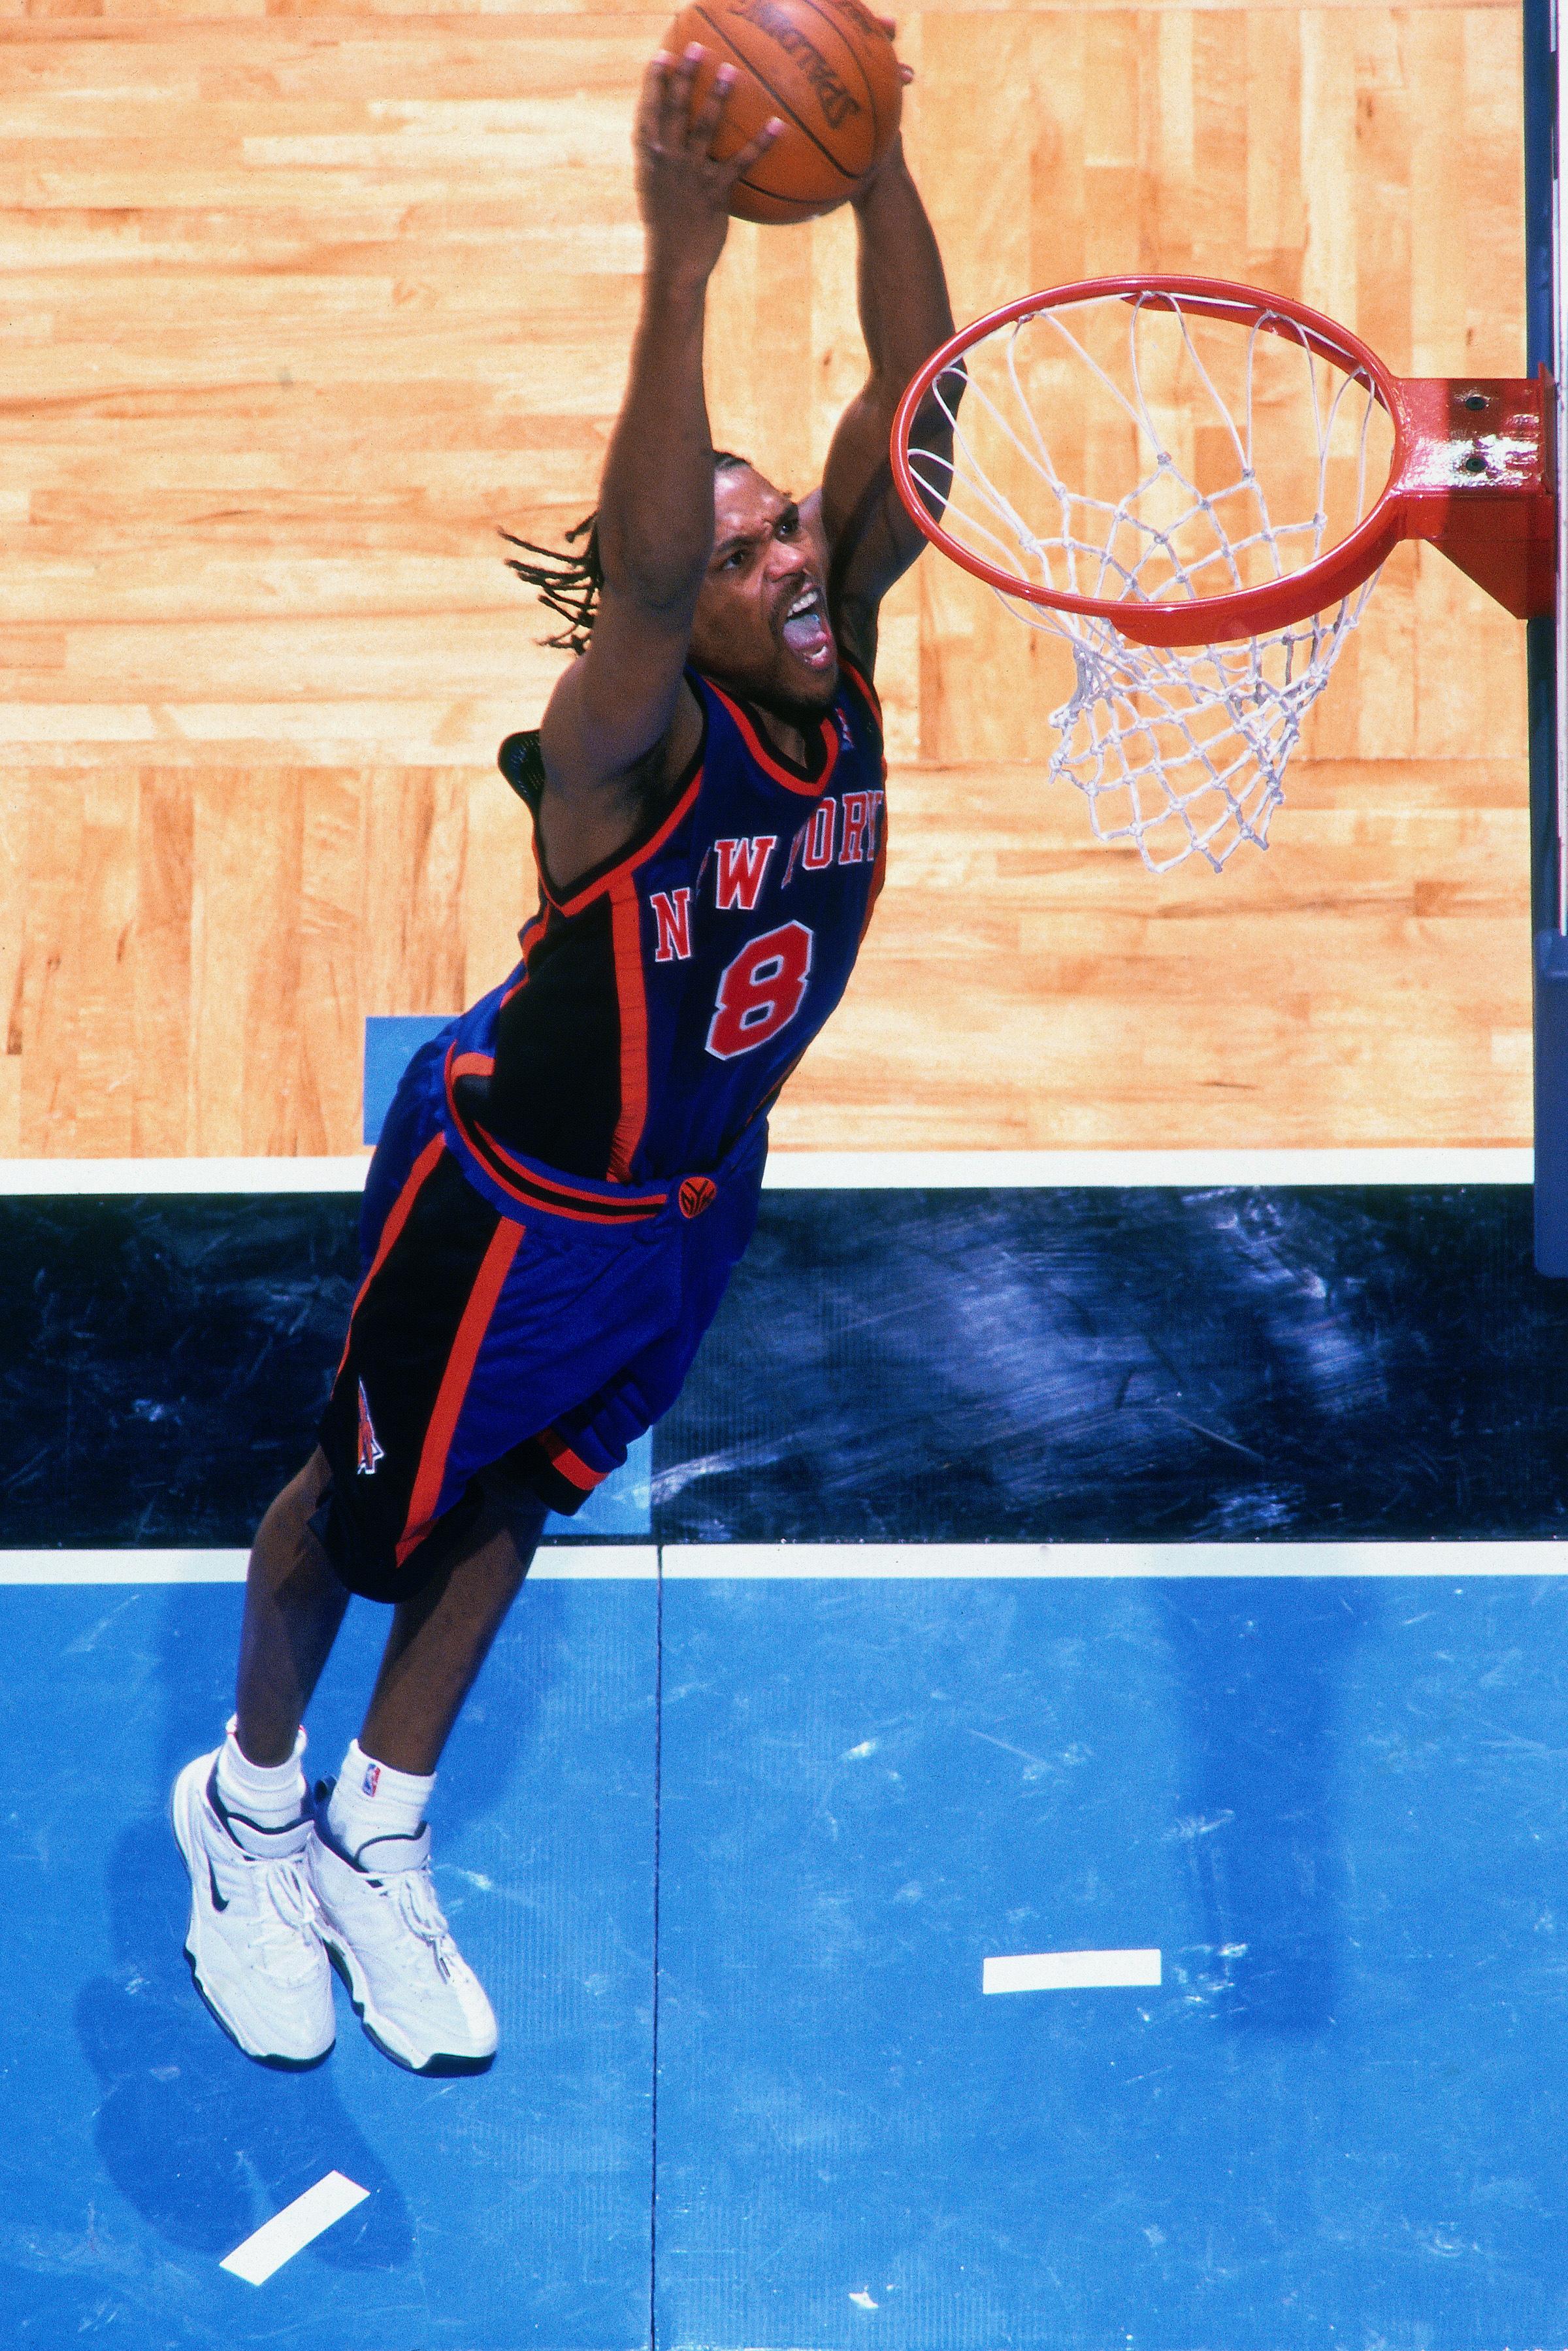 New York Knicks: The NBA 2K18 All-Time All-Snub Team